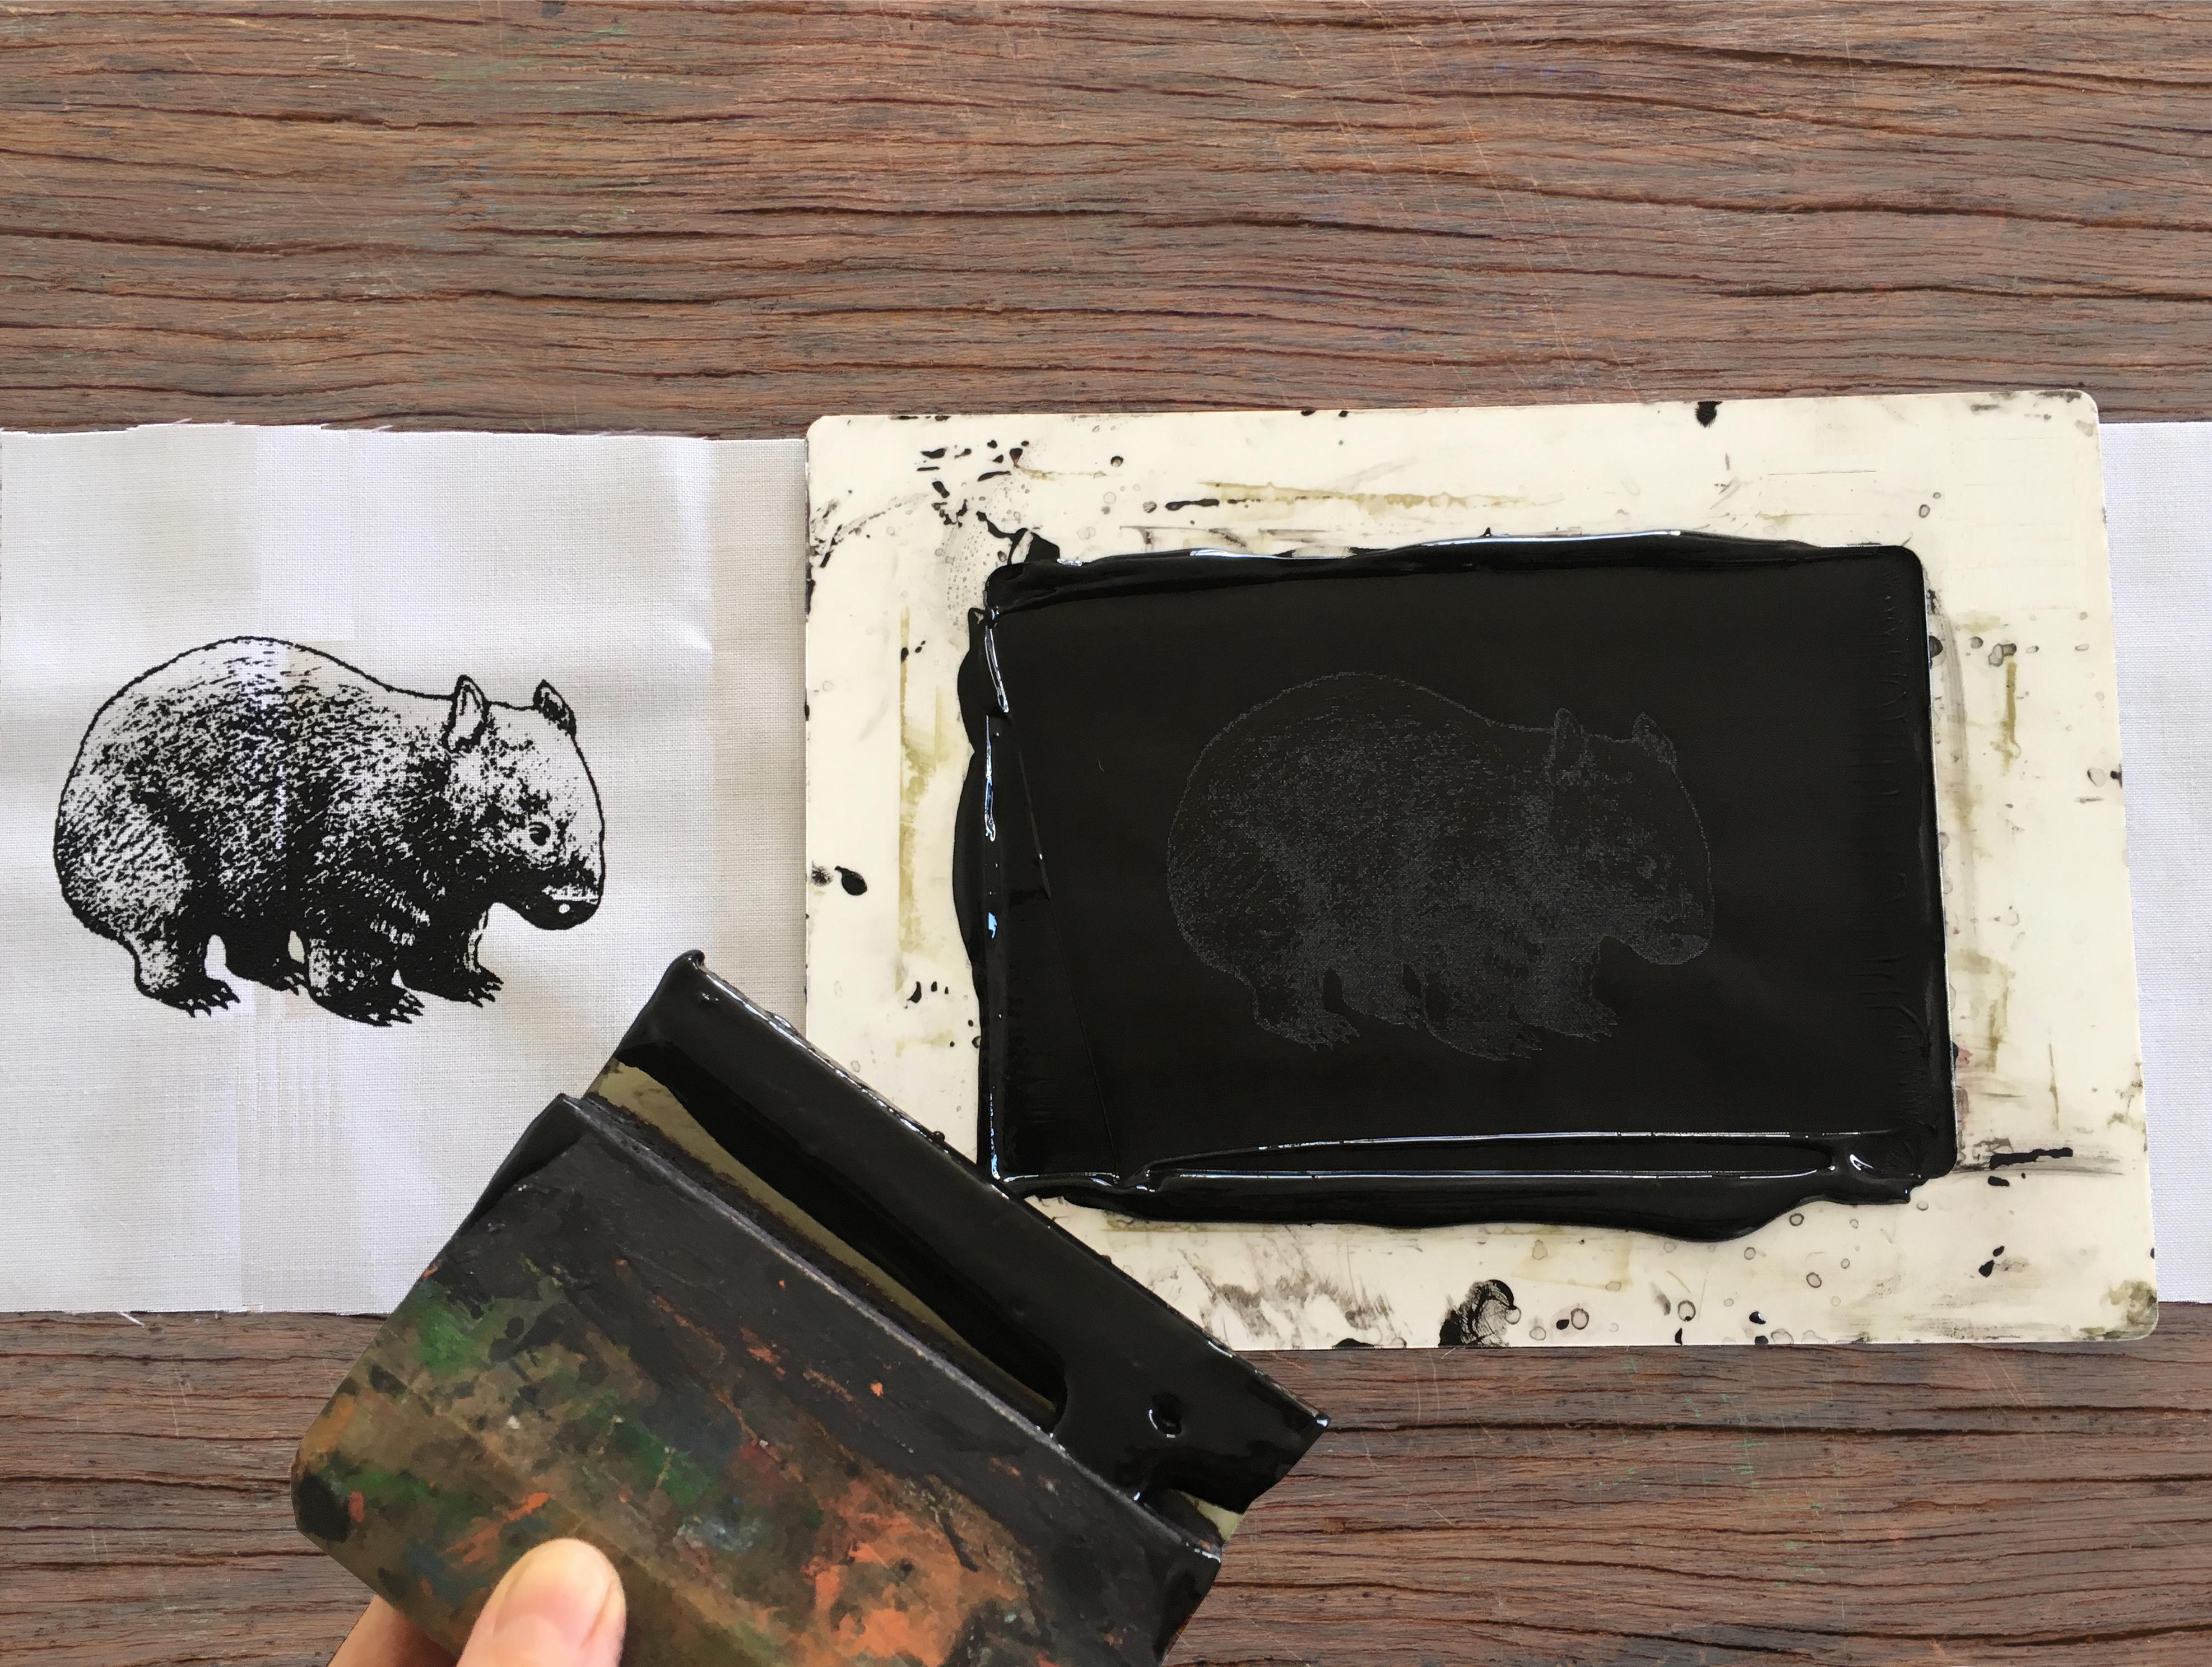 Wombat creation in progress